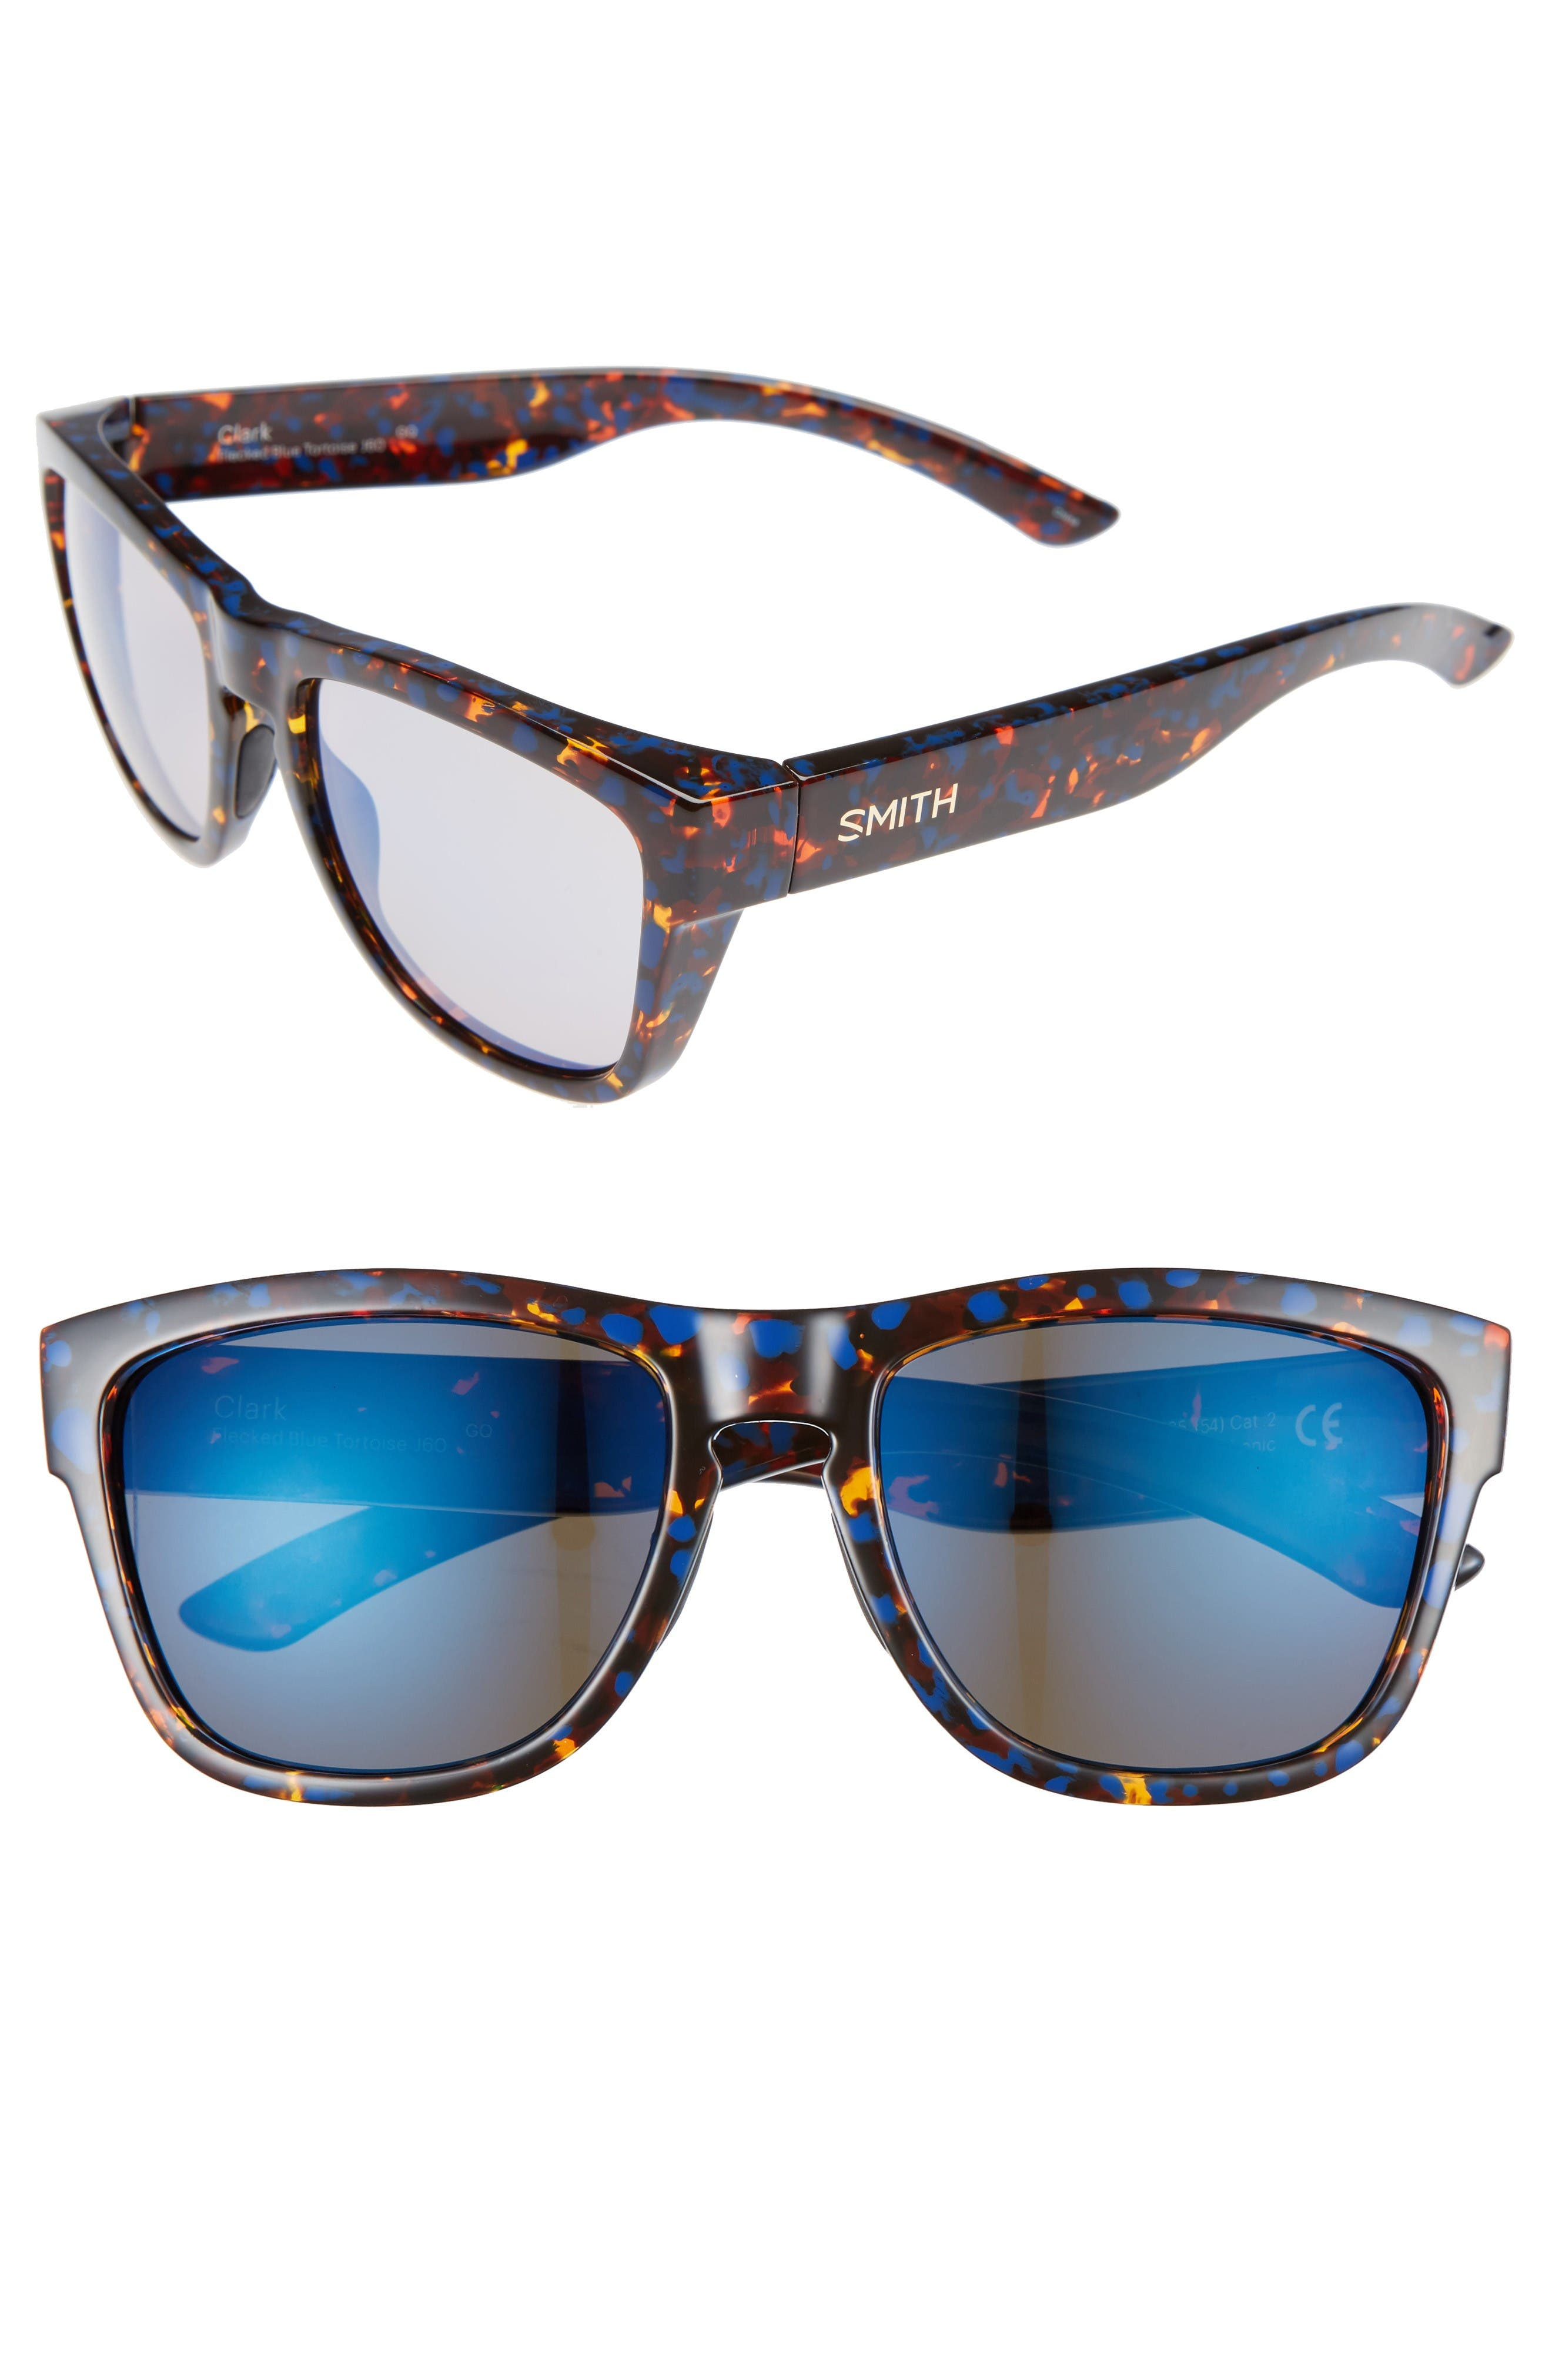 Smith Clark 54mm Sunglasses